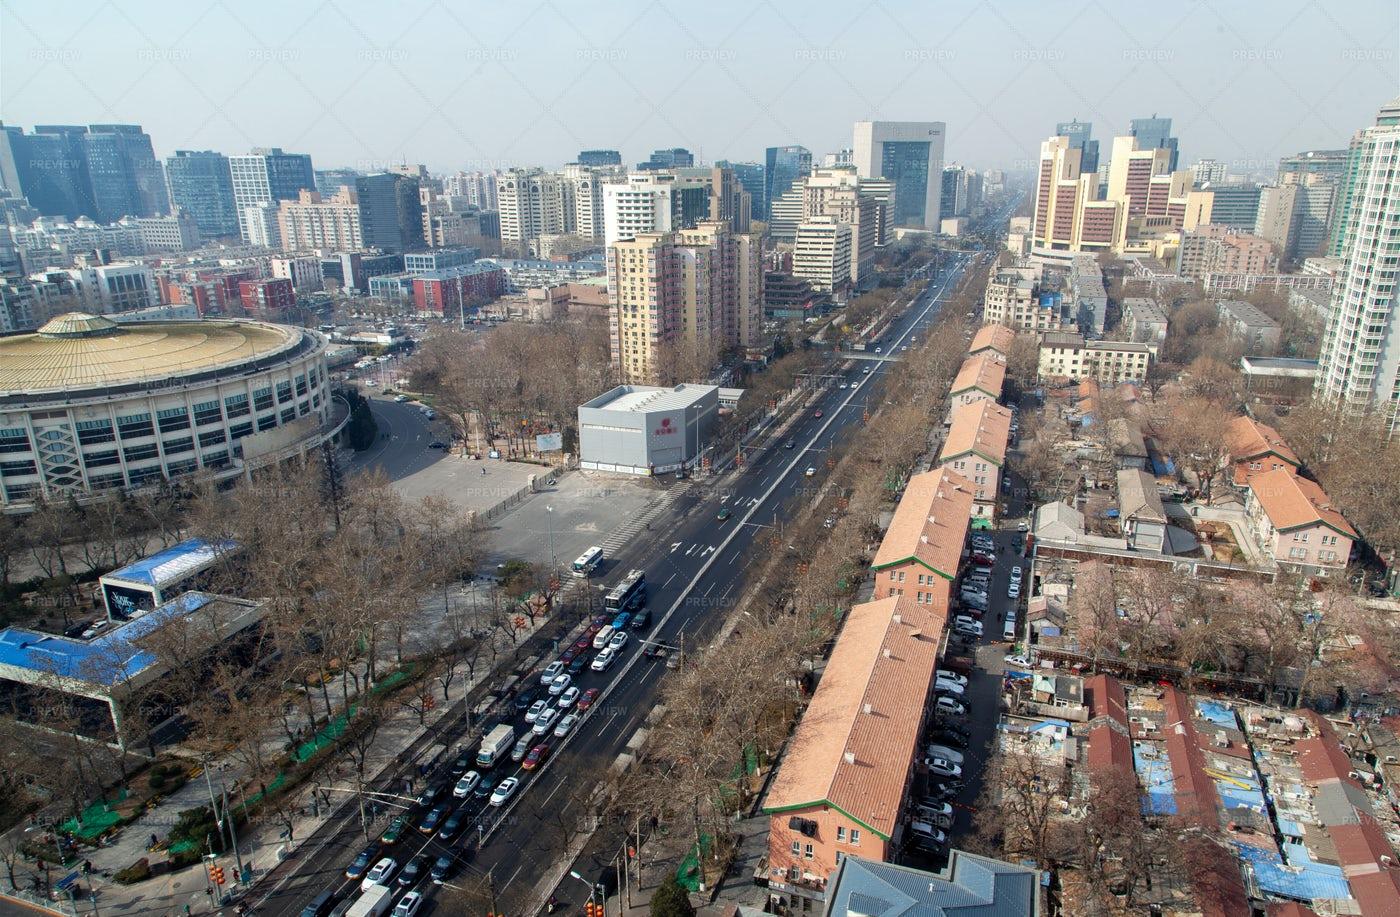 Beijing Cityscape With Heavy Traffic: Stock Photos